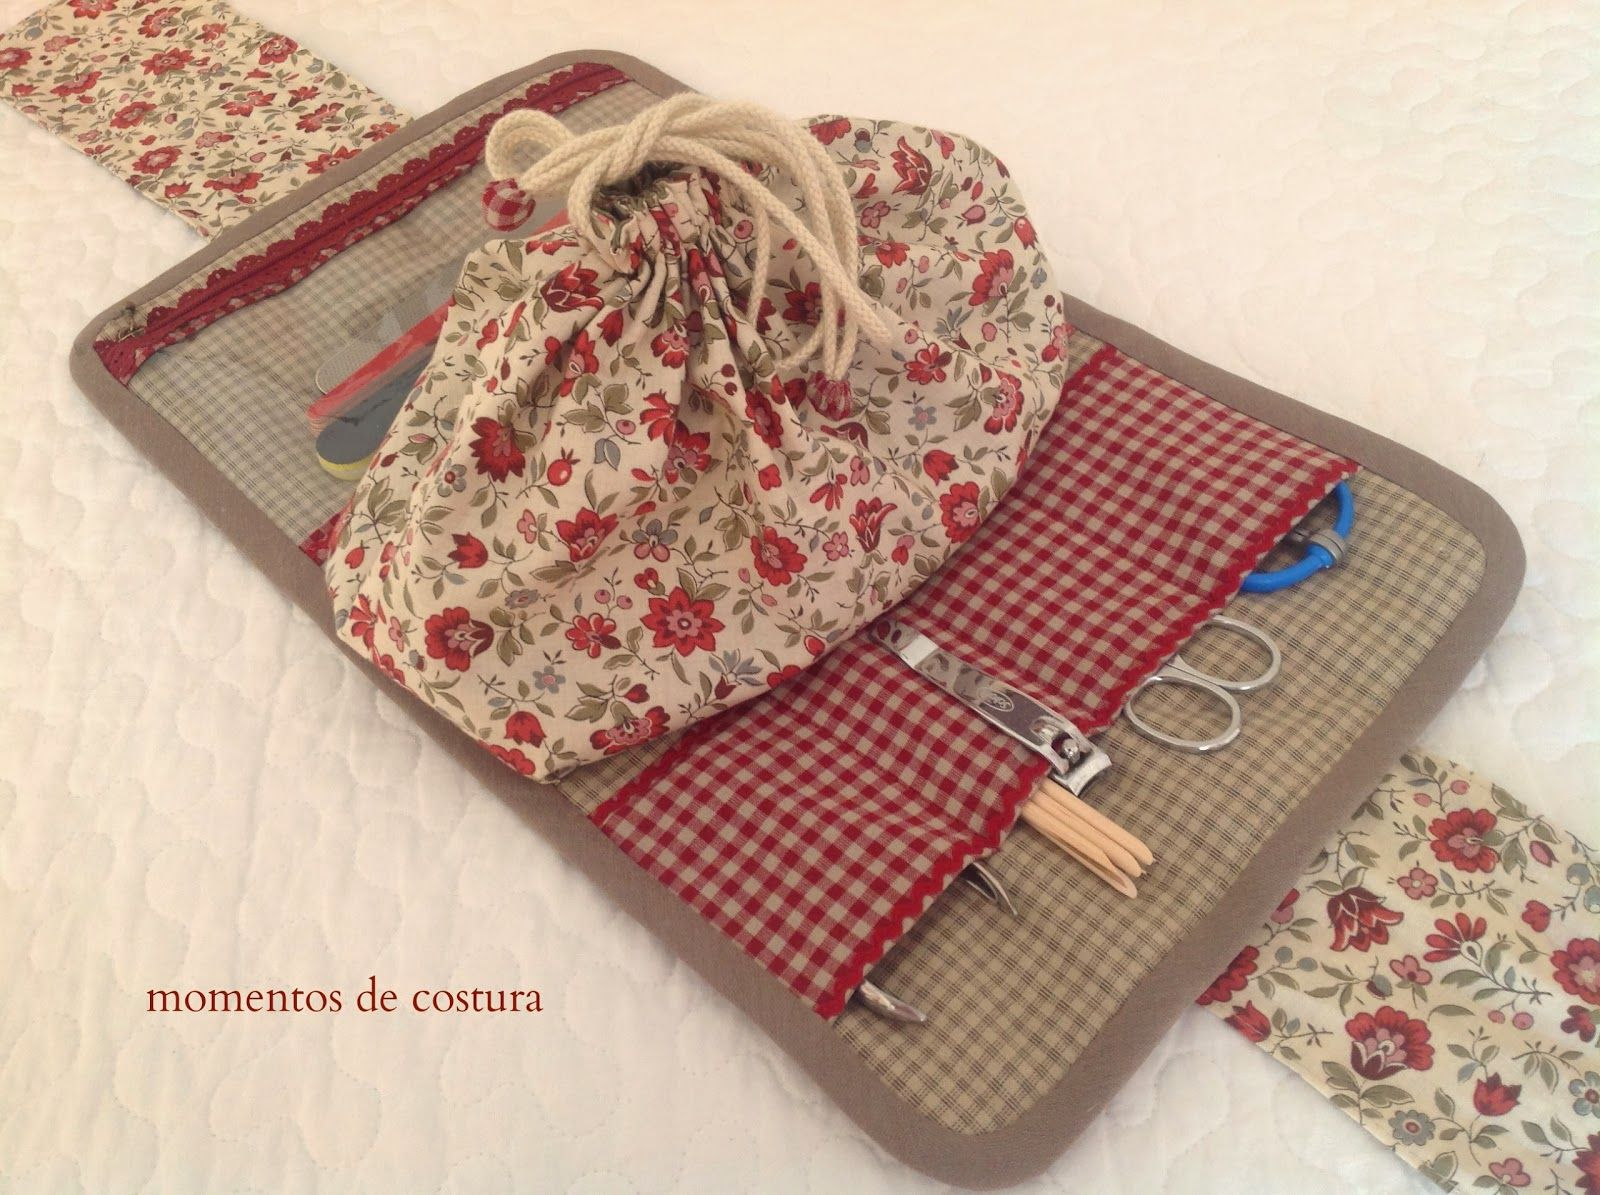 Momentos de costura estuche de manicura teresa restegui - Bolsas de tela manualidades ...